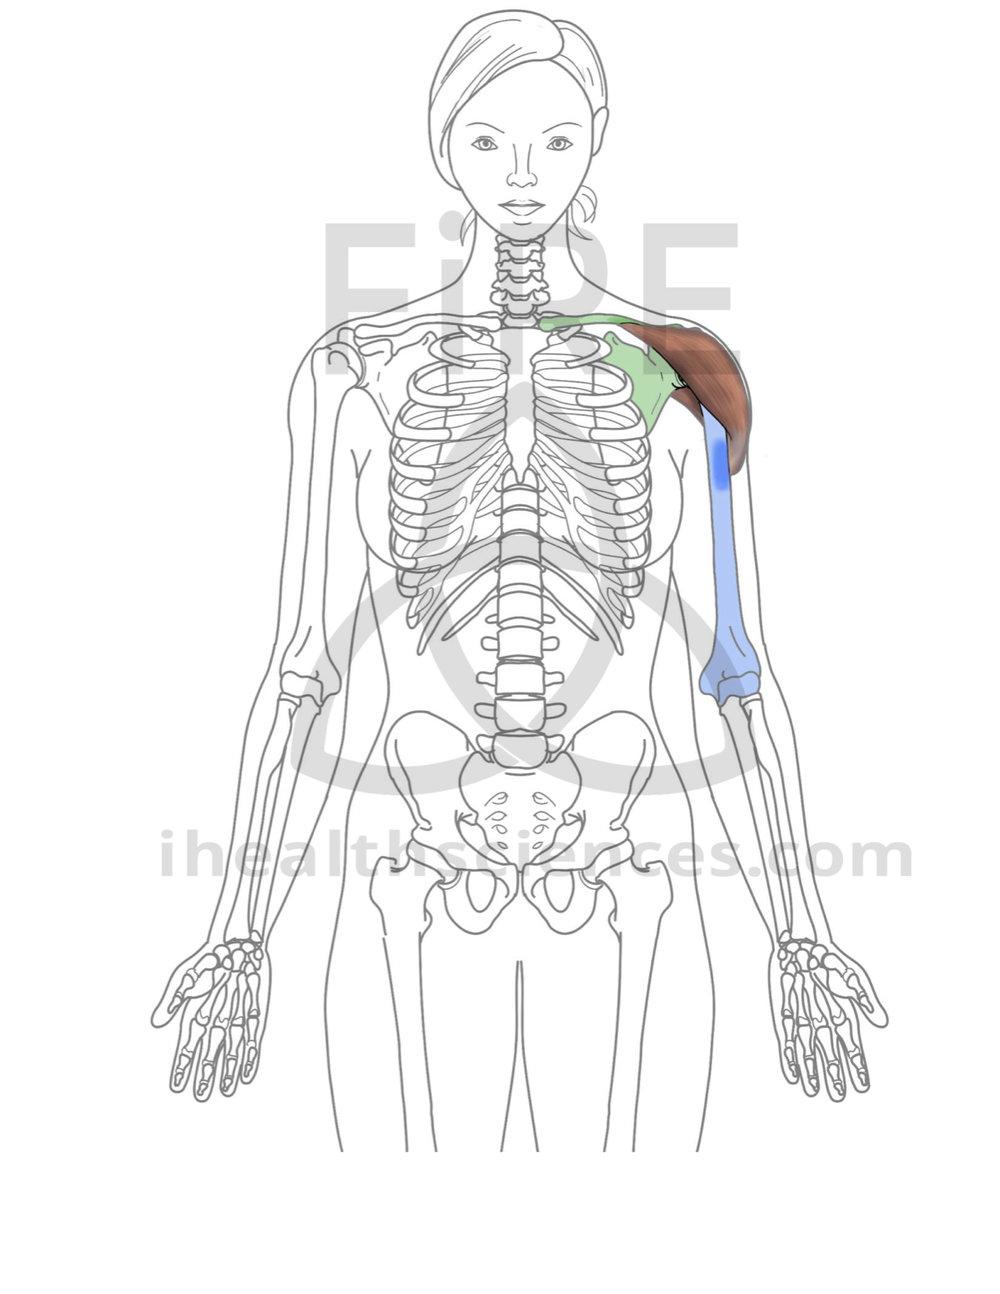 deltoid (anterior view).jpg